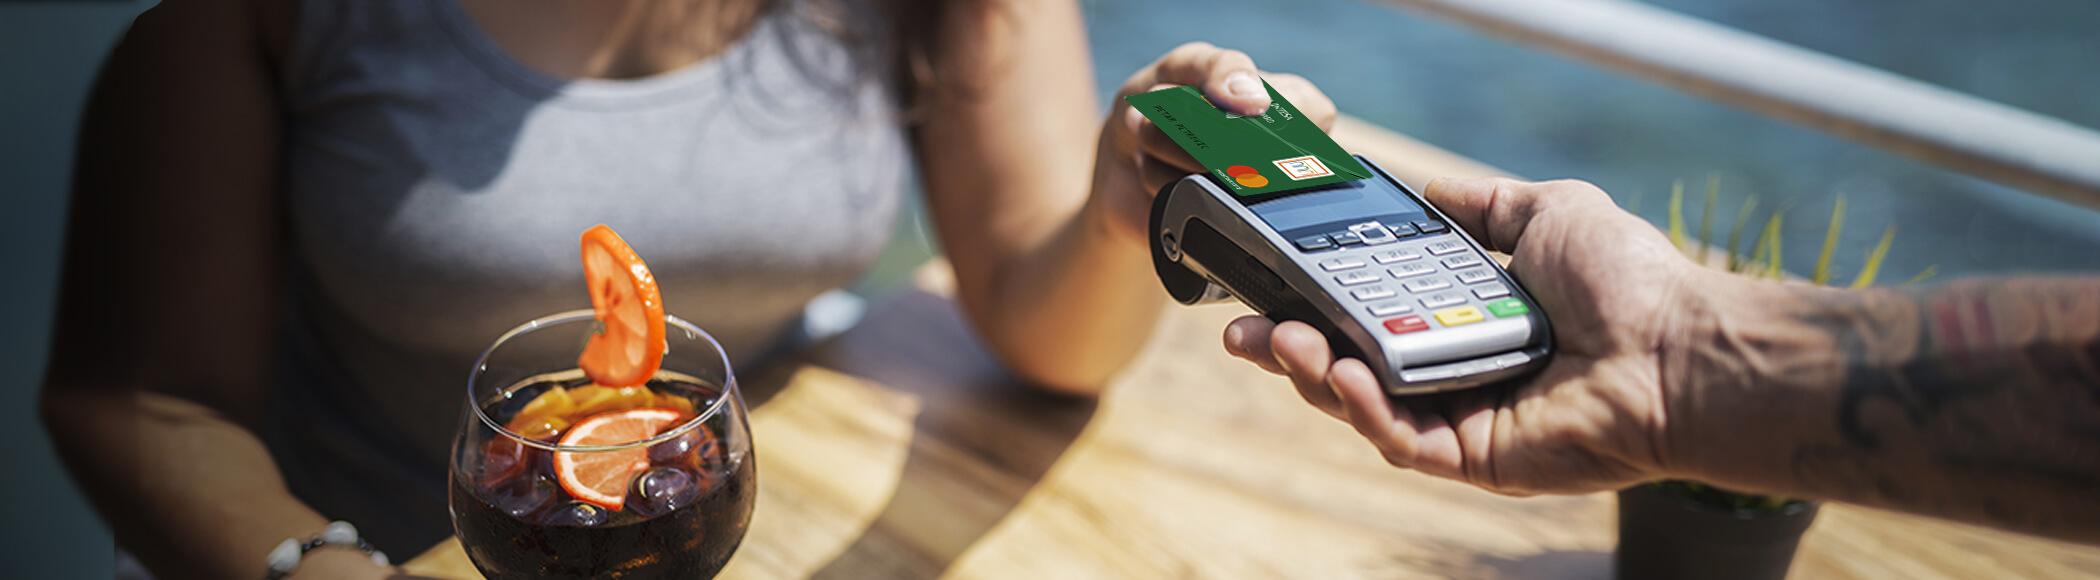 Mastercard kreditna kartica